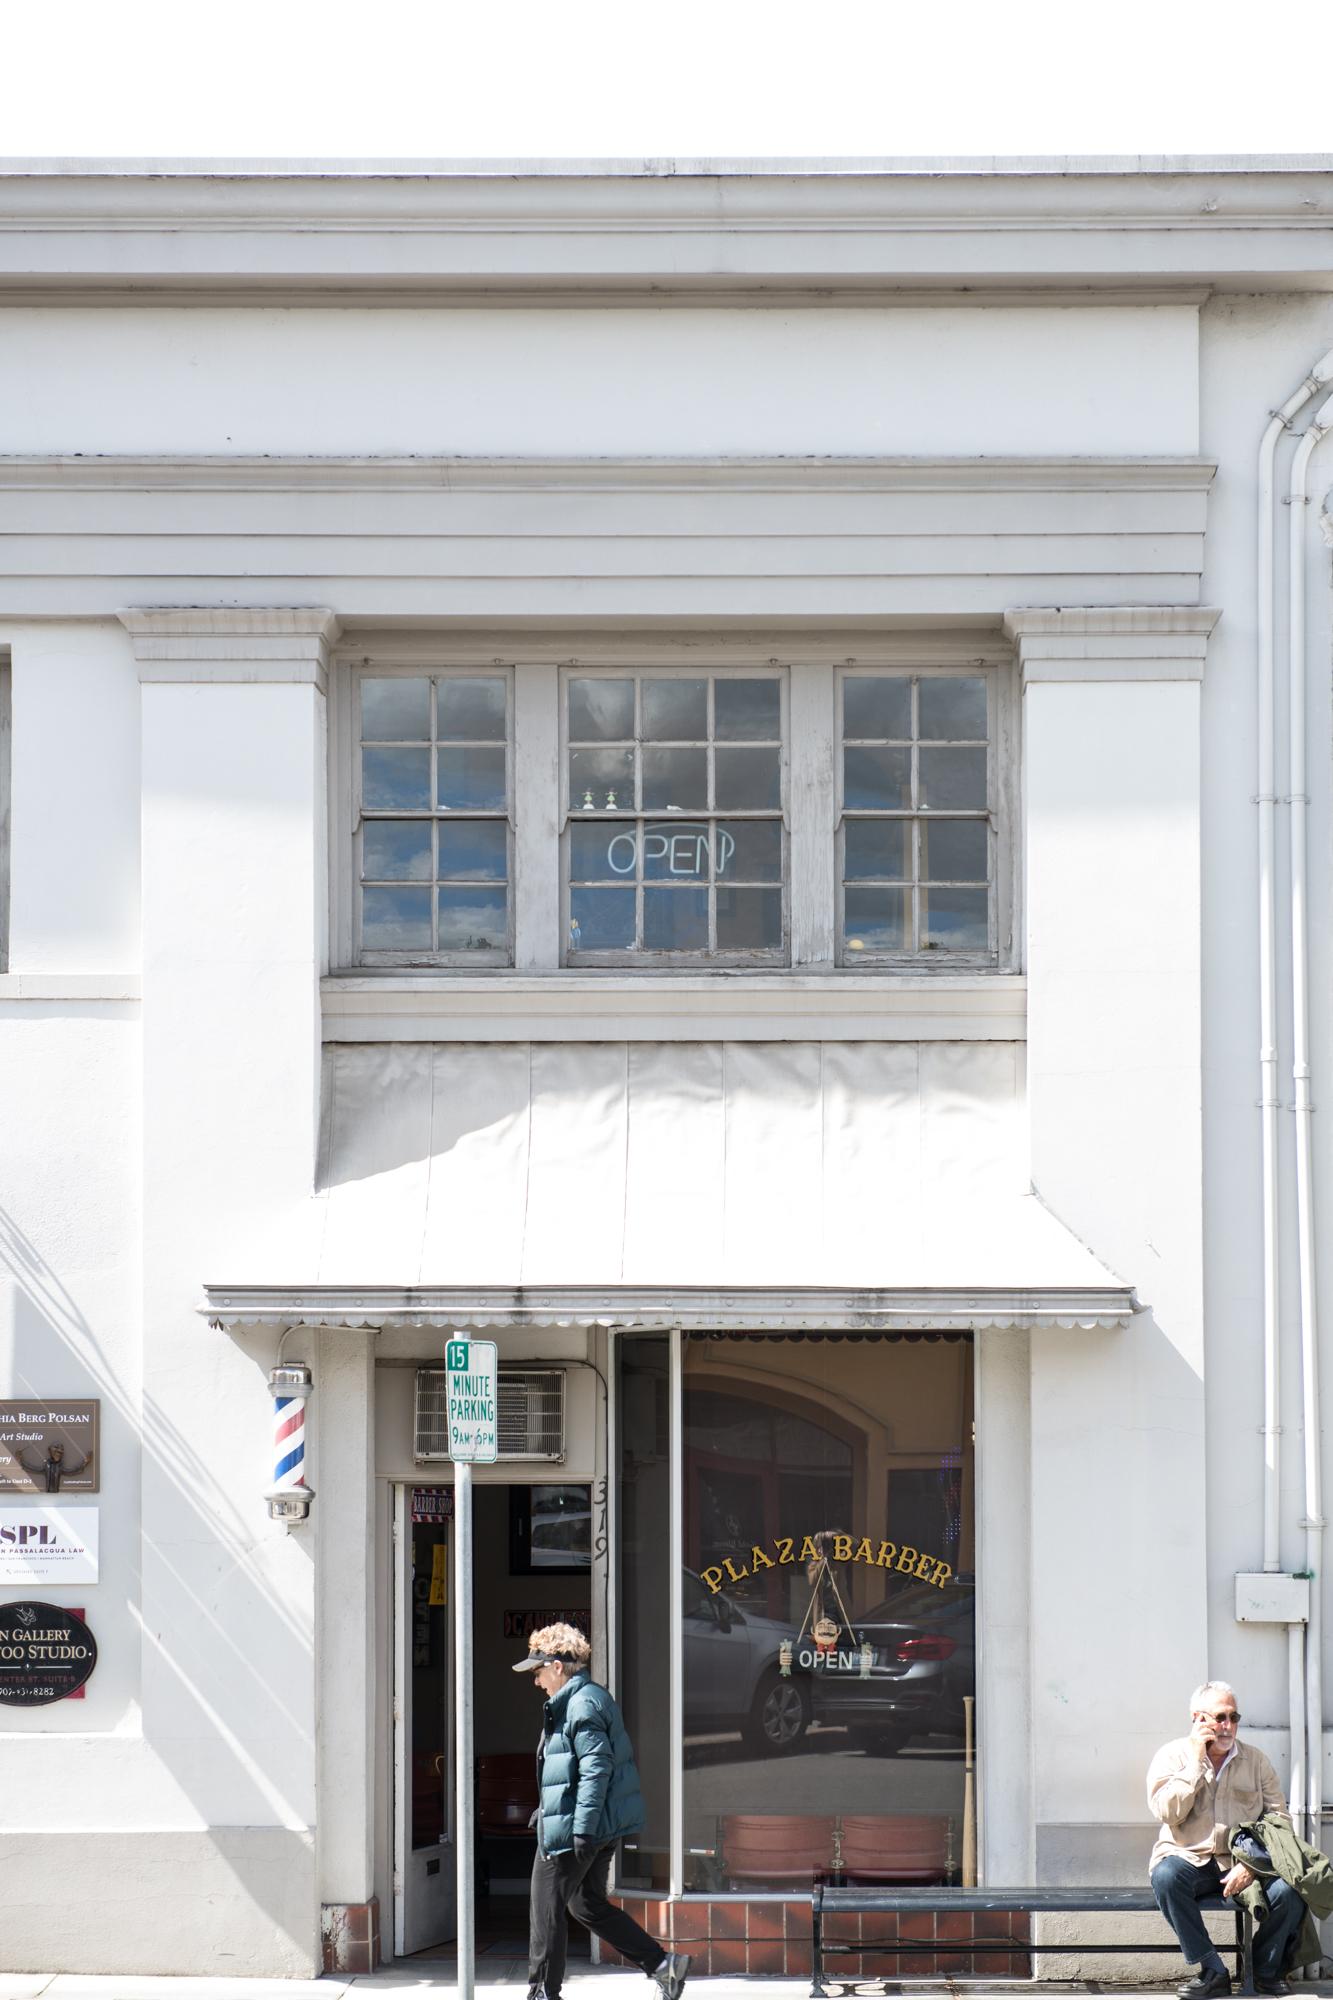 Plaza barber shop front white building